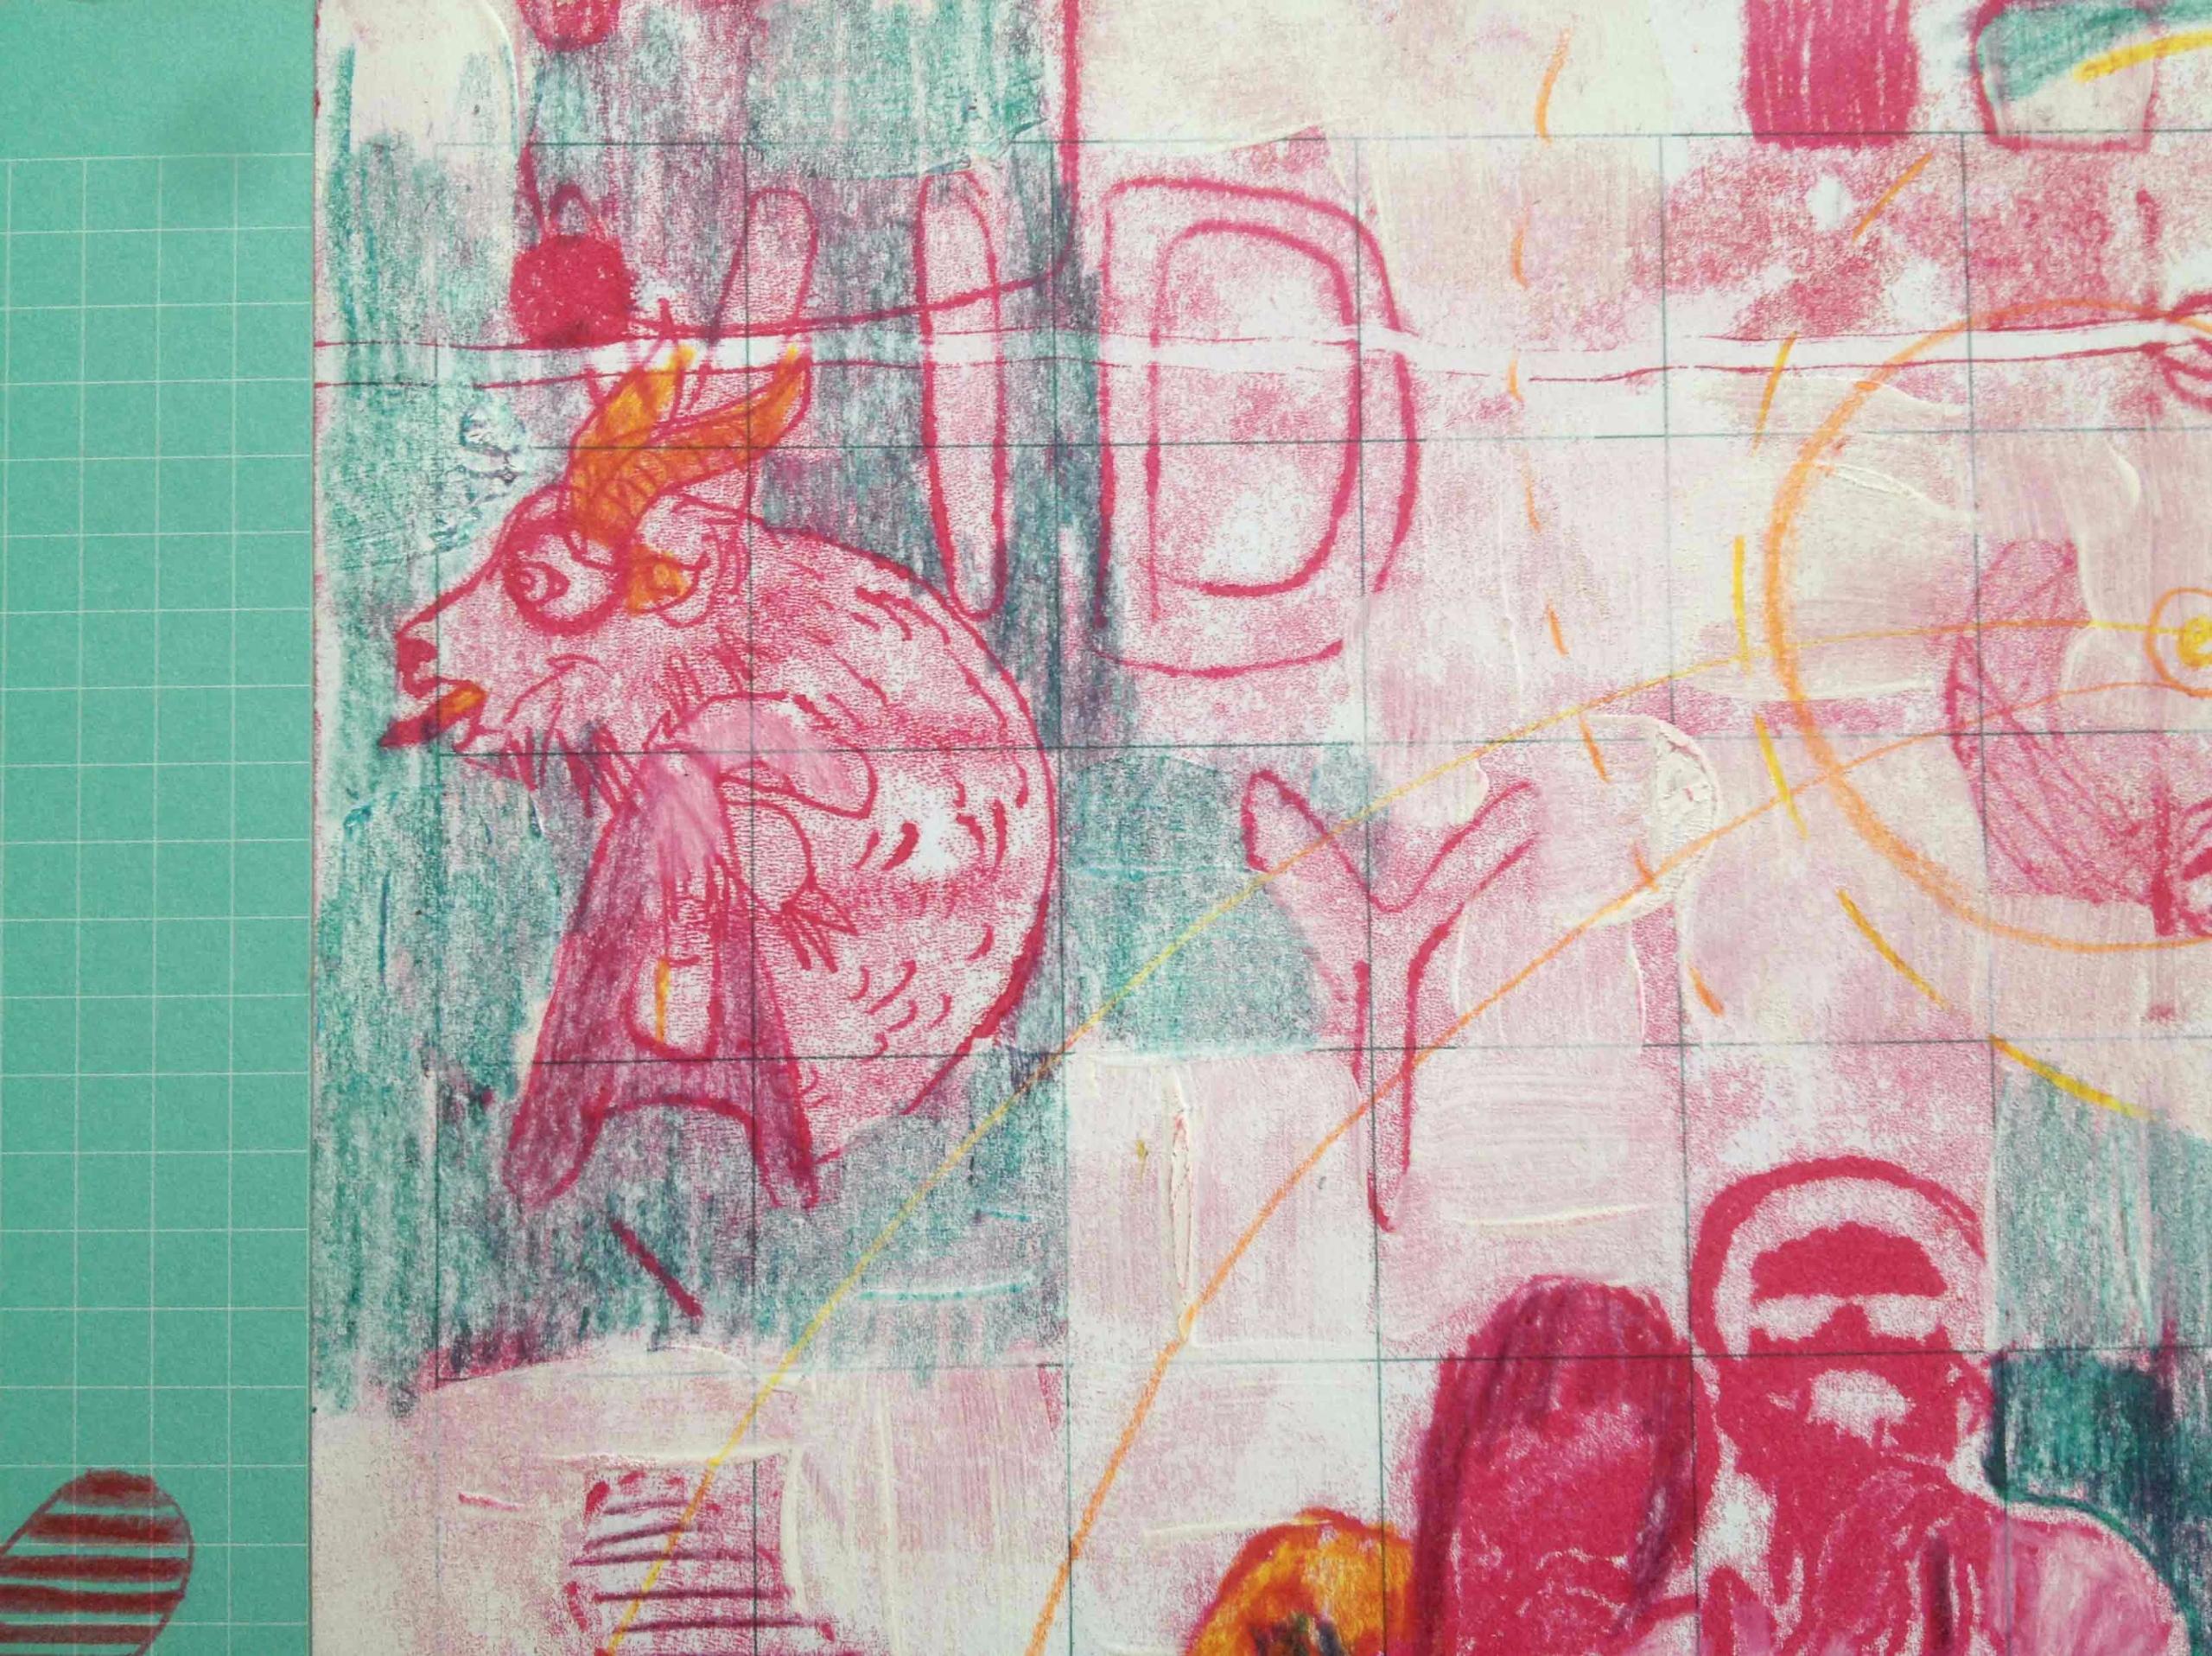 Monotype + pencil. Serie drawin - hauering | ello